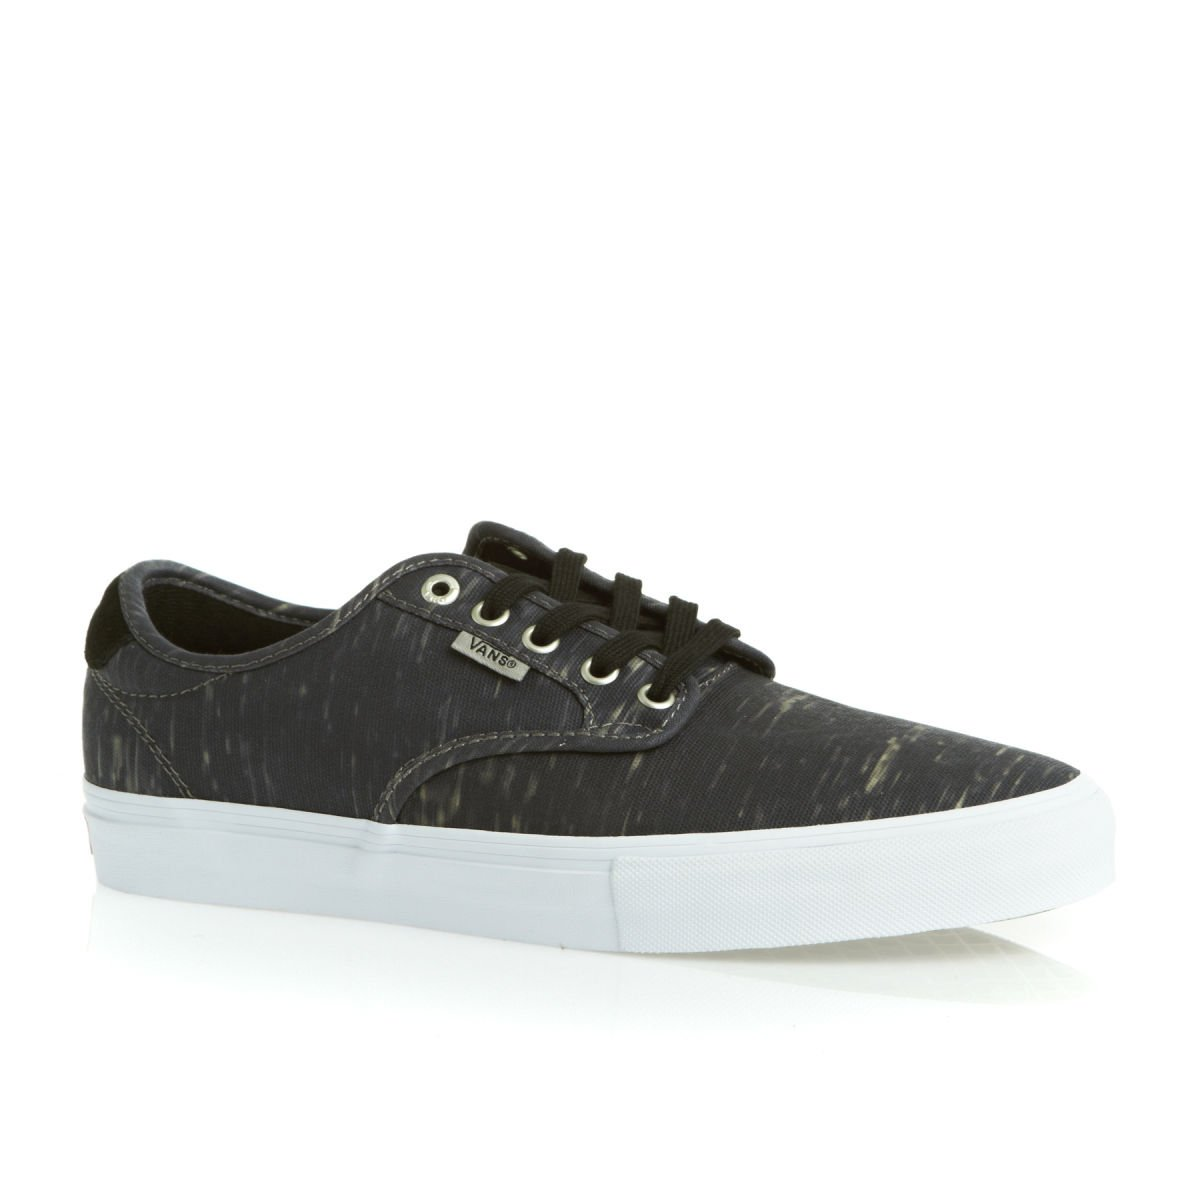 Vans AUTHENTIC, Unisex-Erwachsene Sneakers  44.5 EU (Static) Black